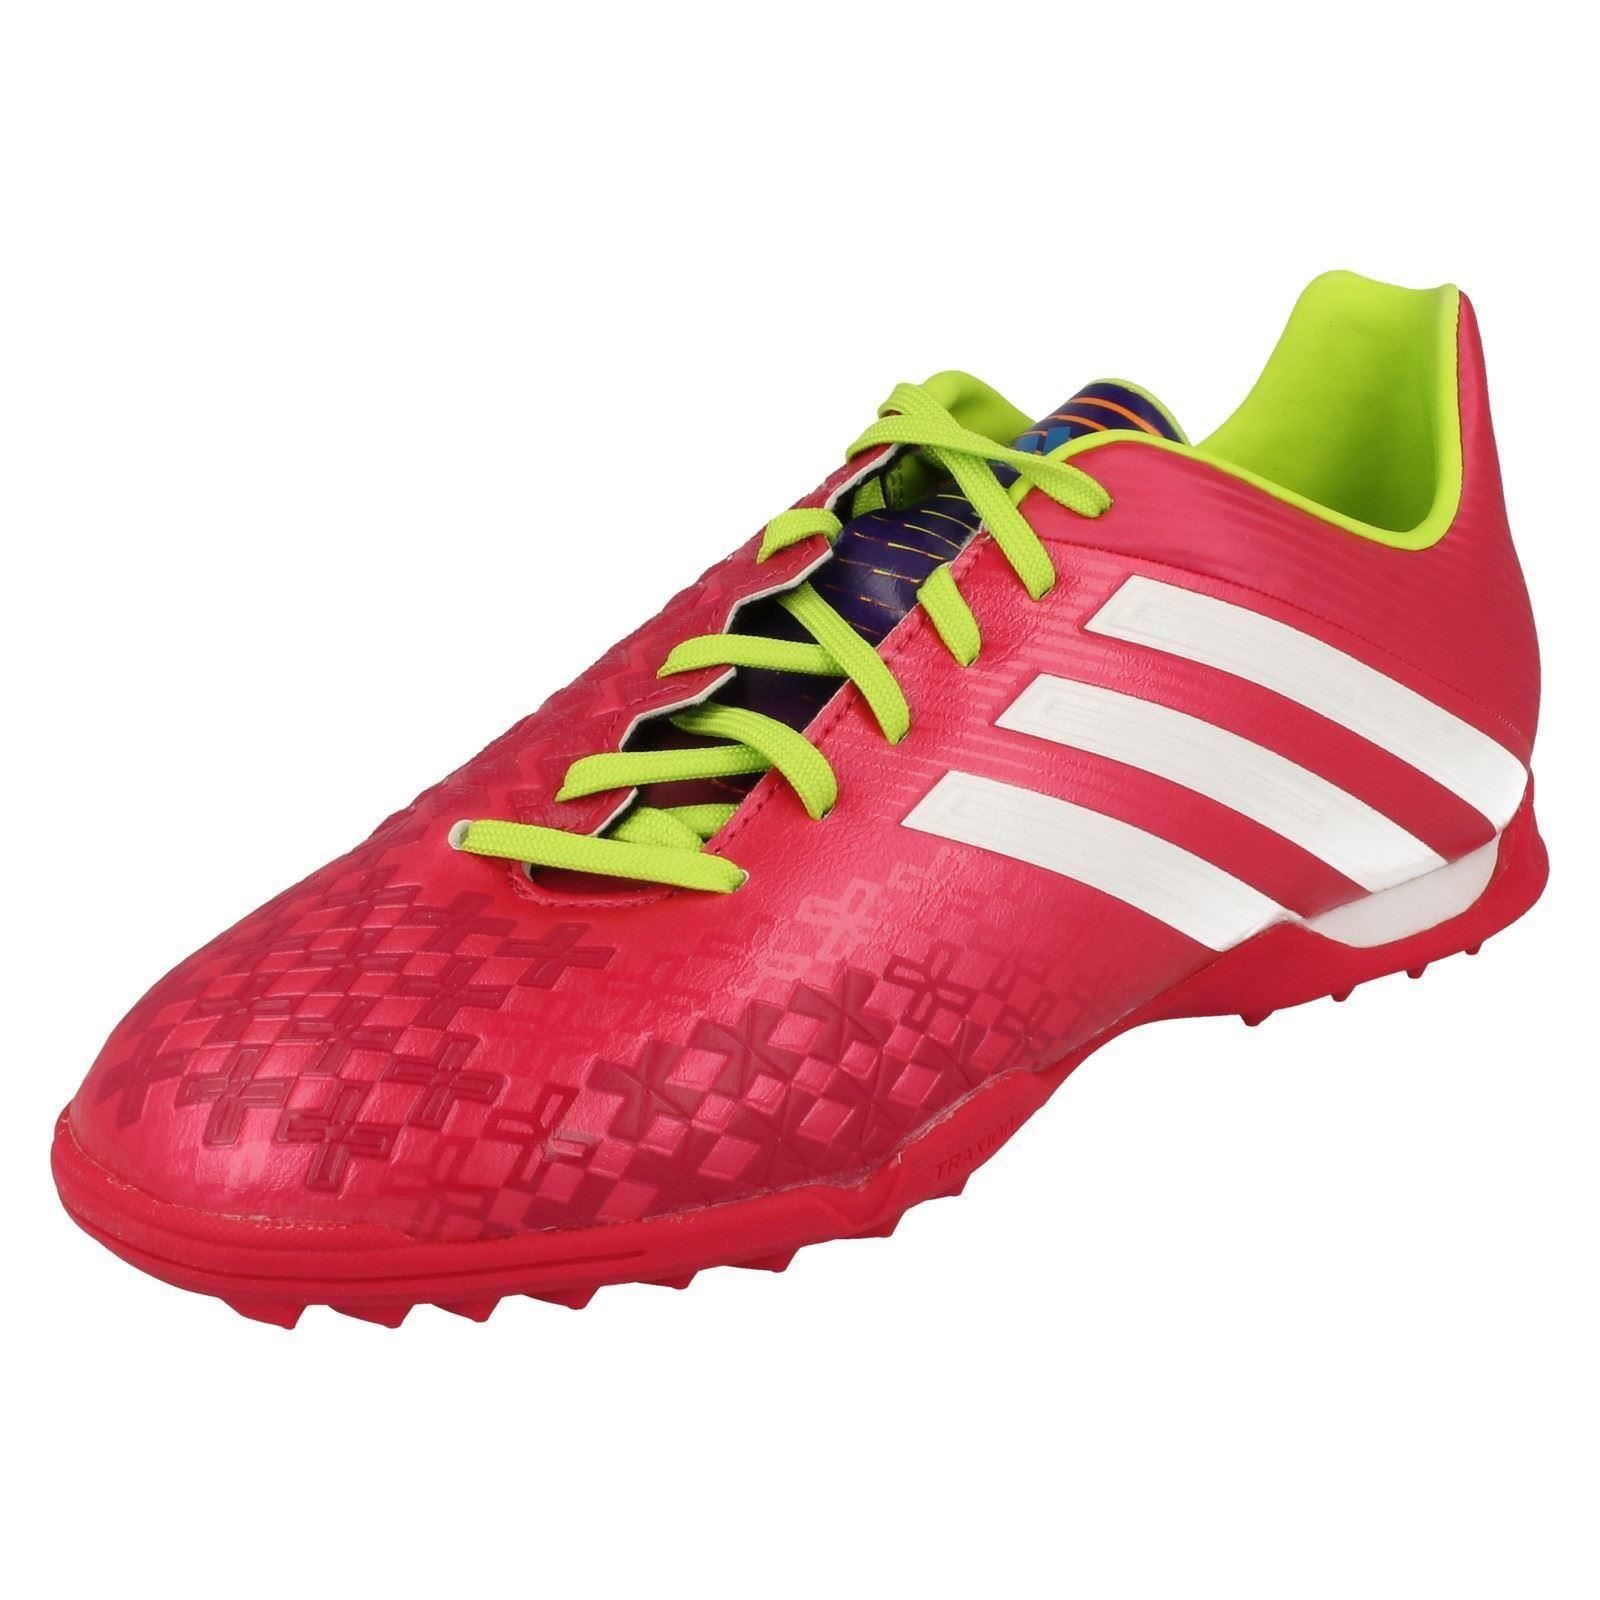 ragazzi adidas football dei formatori p absolado lz trx tf. ebay